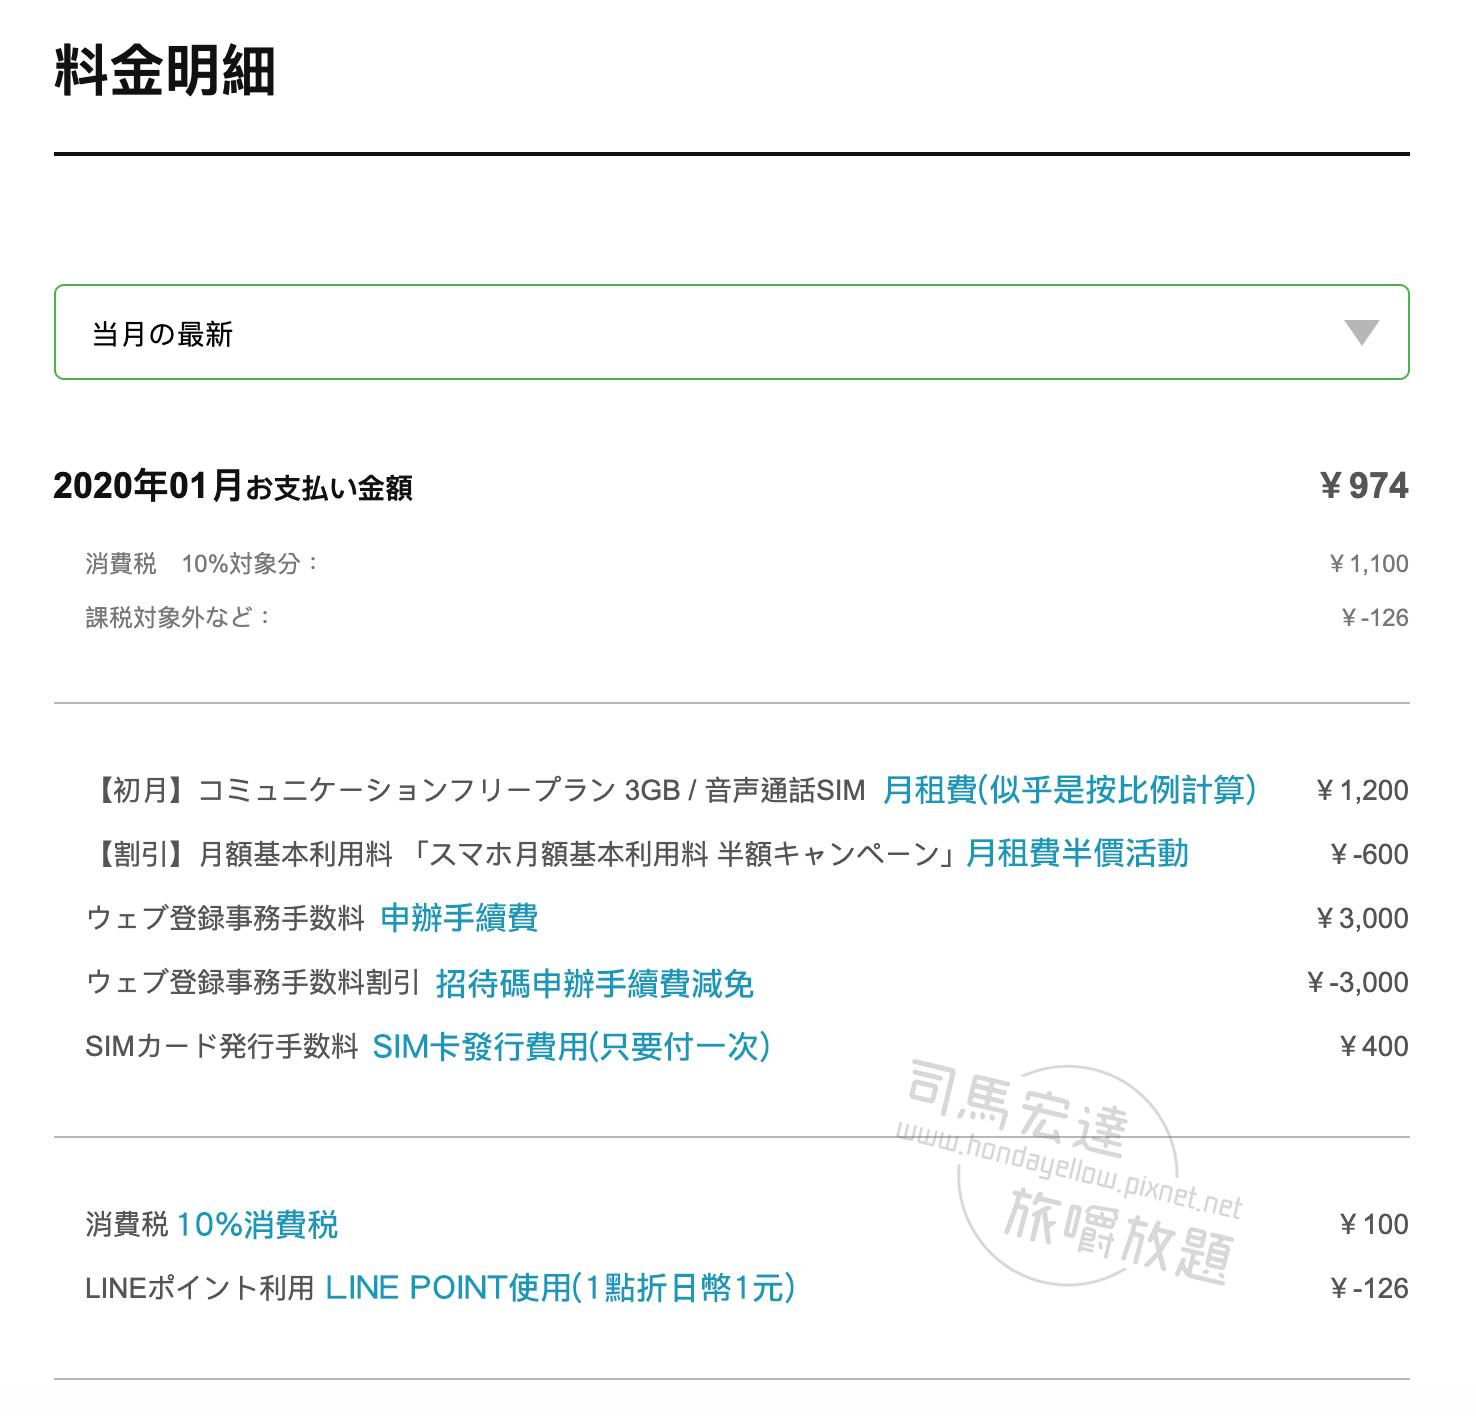 LINE MOBILE月租明細.jpg